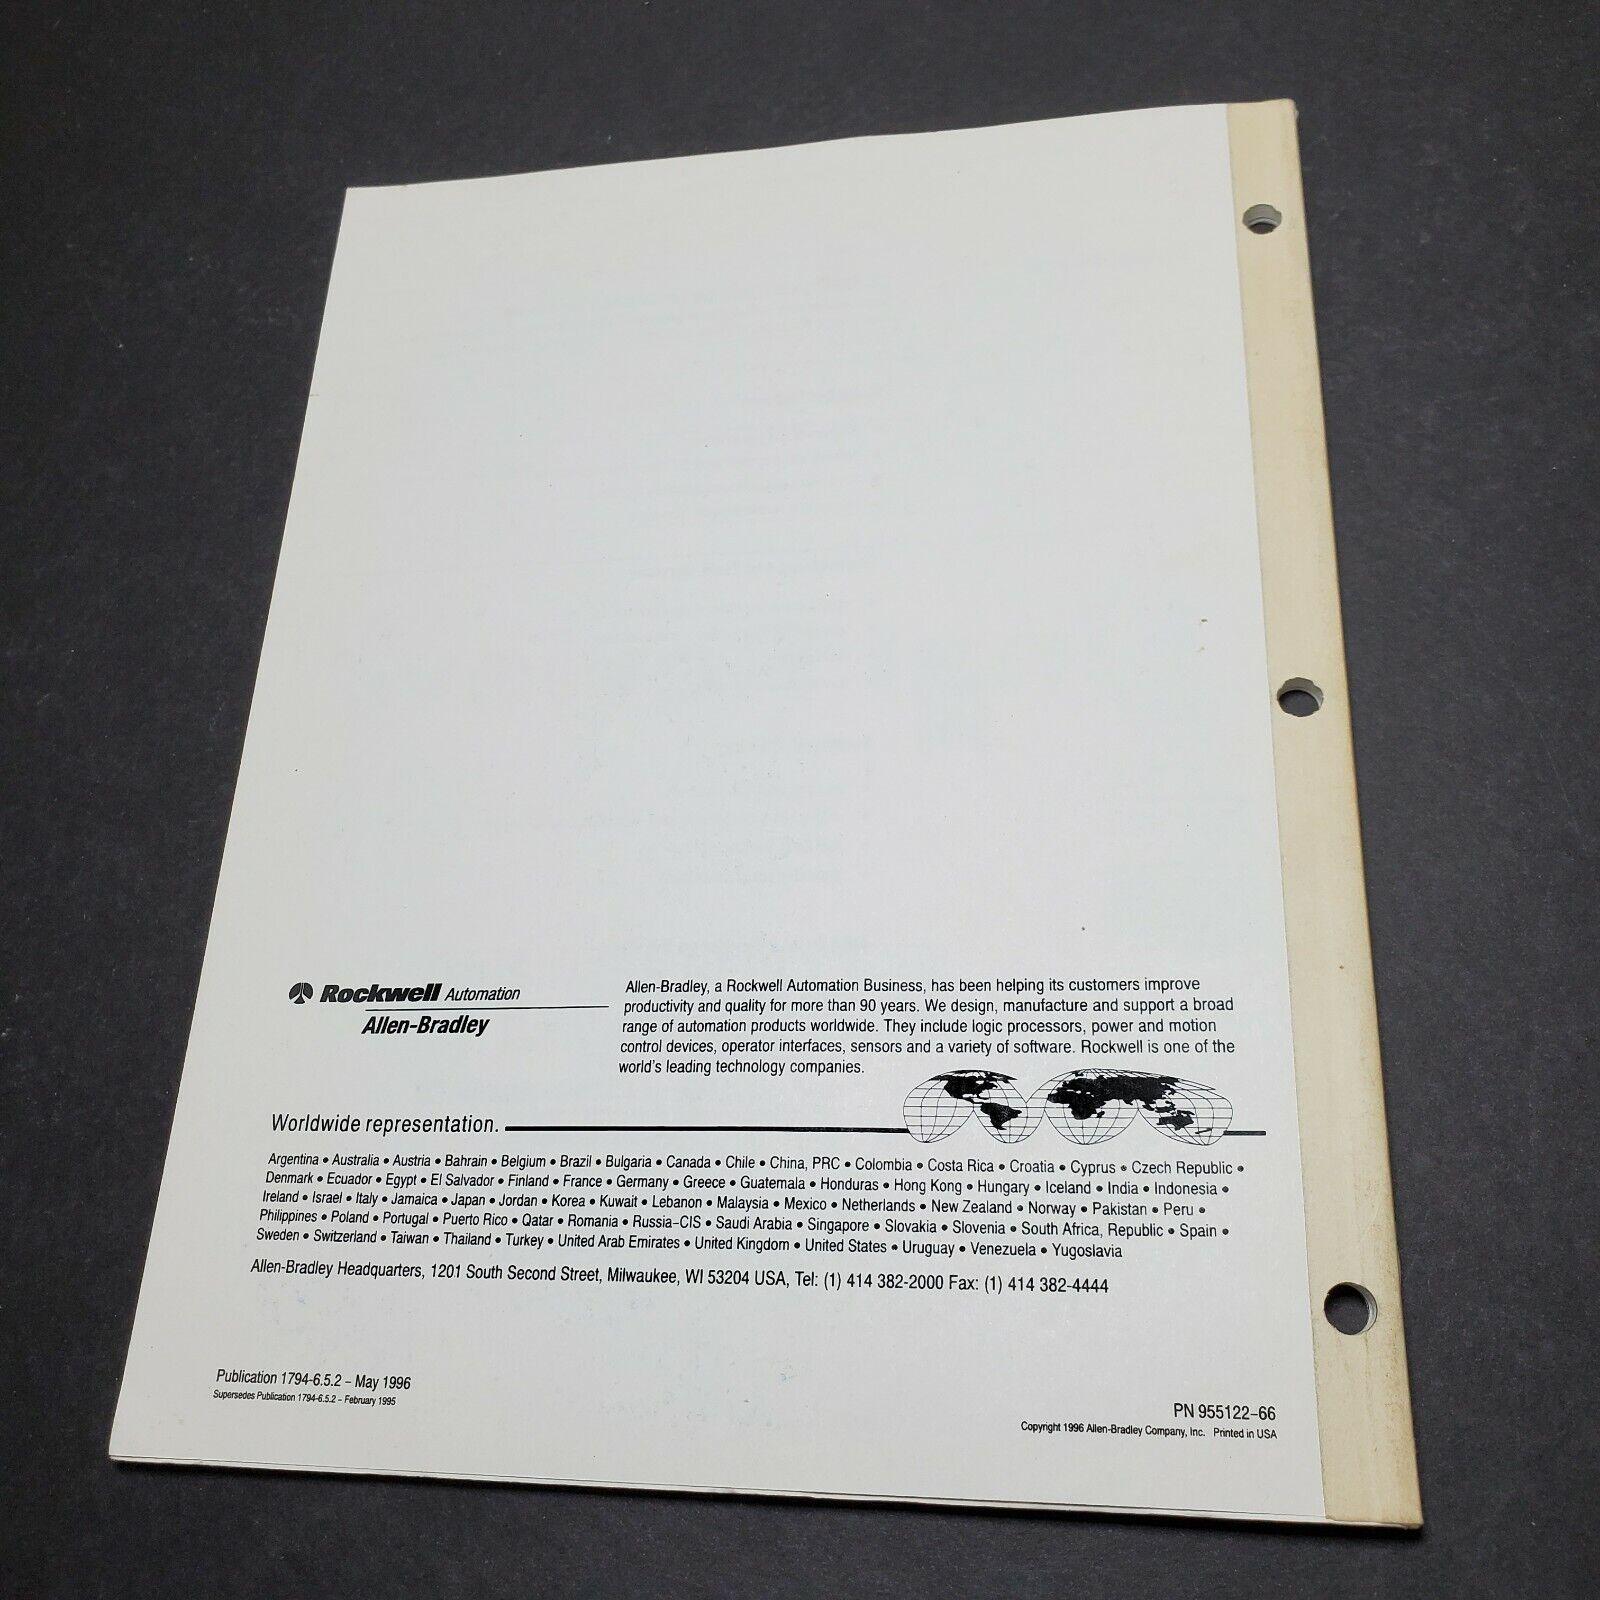 Allen-Bradley Flex I/O Analog Modules Cat No 1794-IE8 -OE4 Ser B User Manual - $19.95